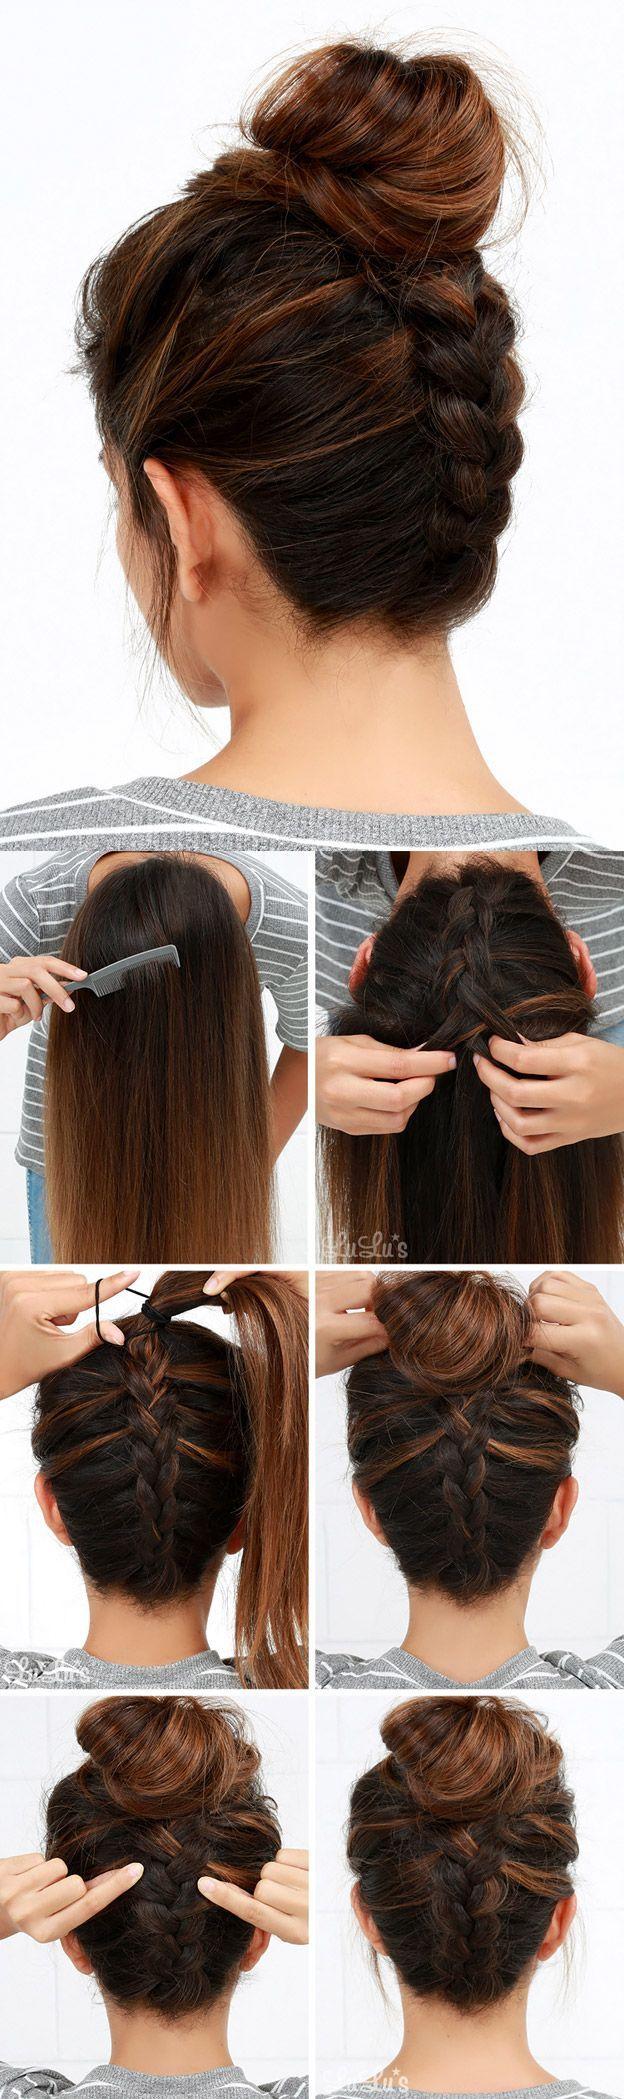 Pony hairstyles for medium length hair hair tutorials and